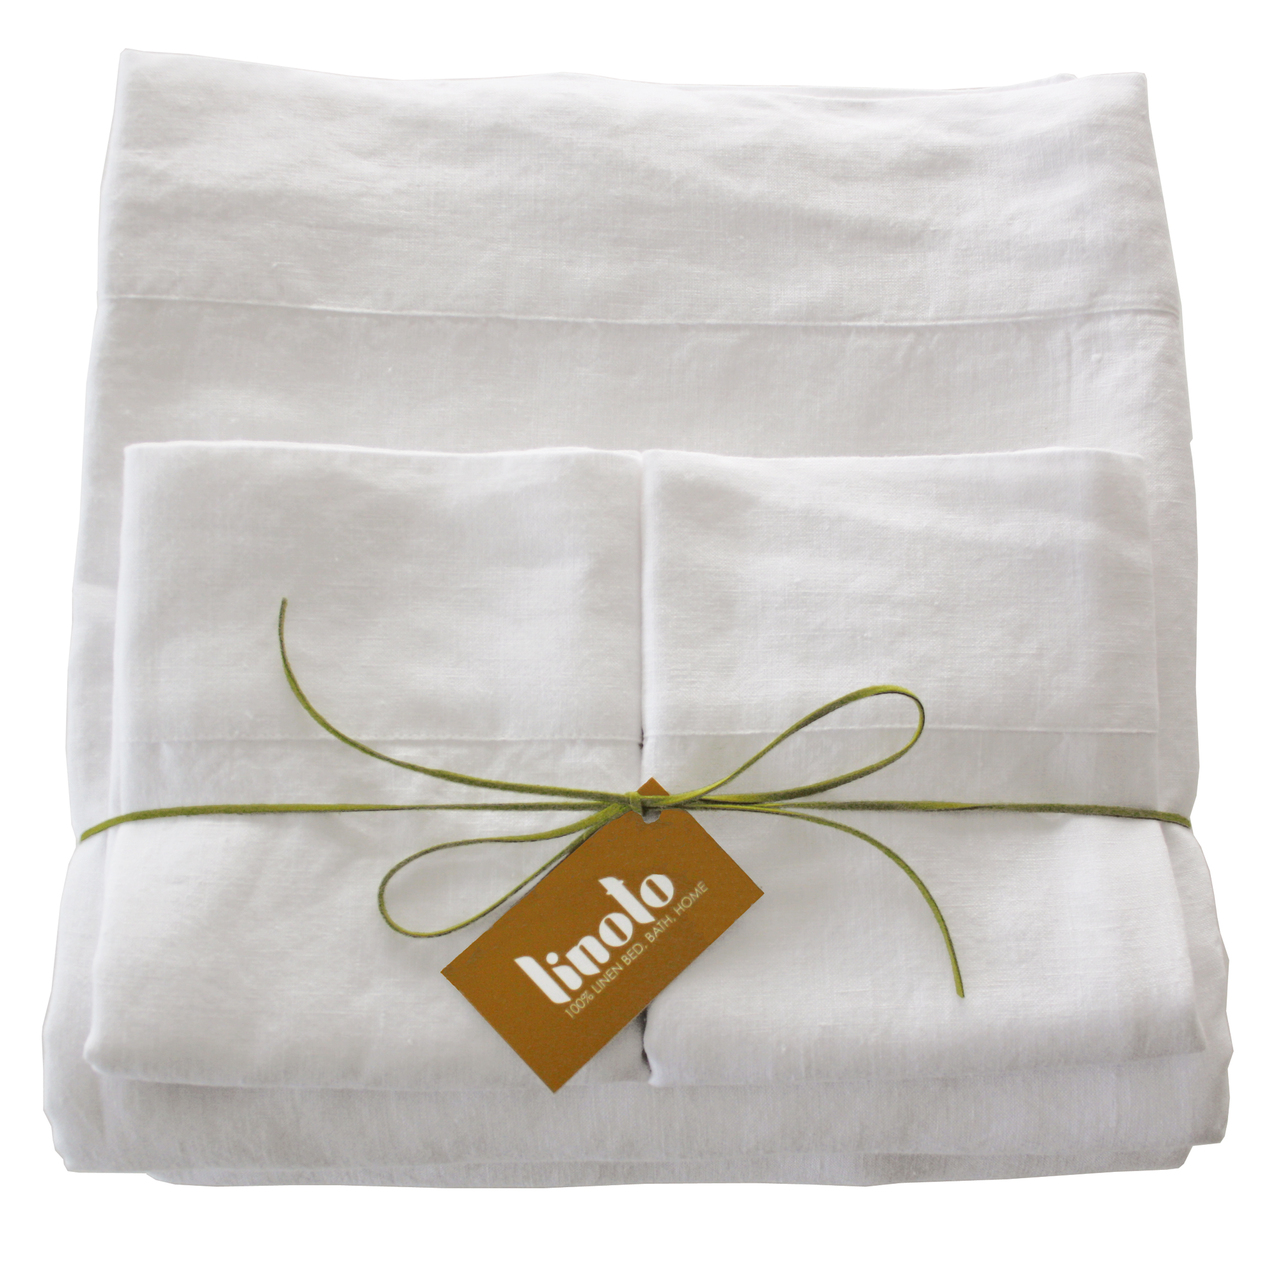 Belgian eco-linen sheet set